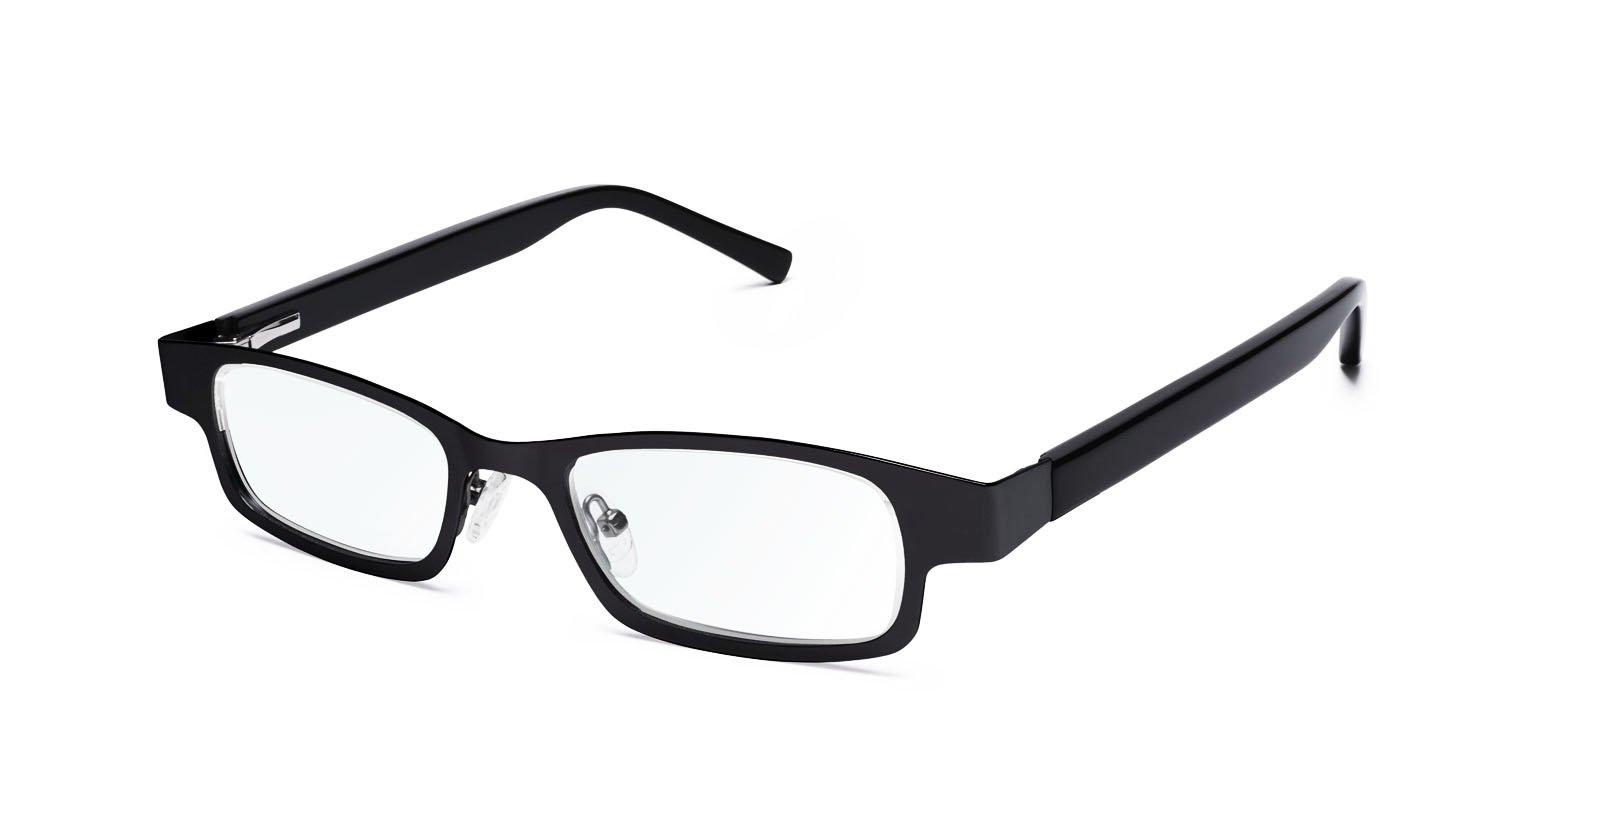 Eyejusters, Self-Adjustable Glasses, Combination, Black